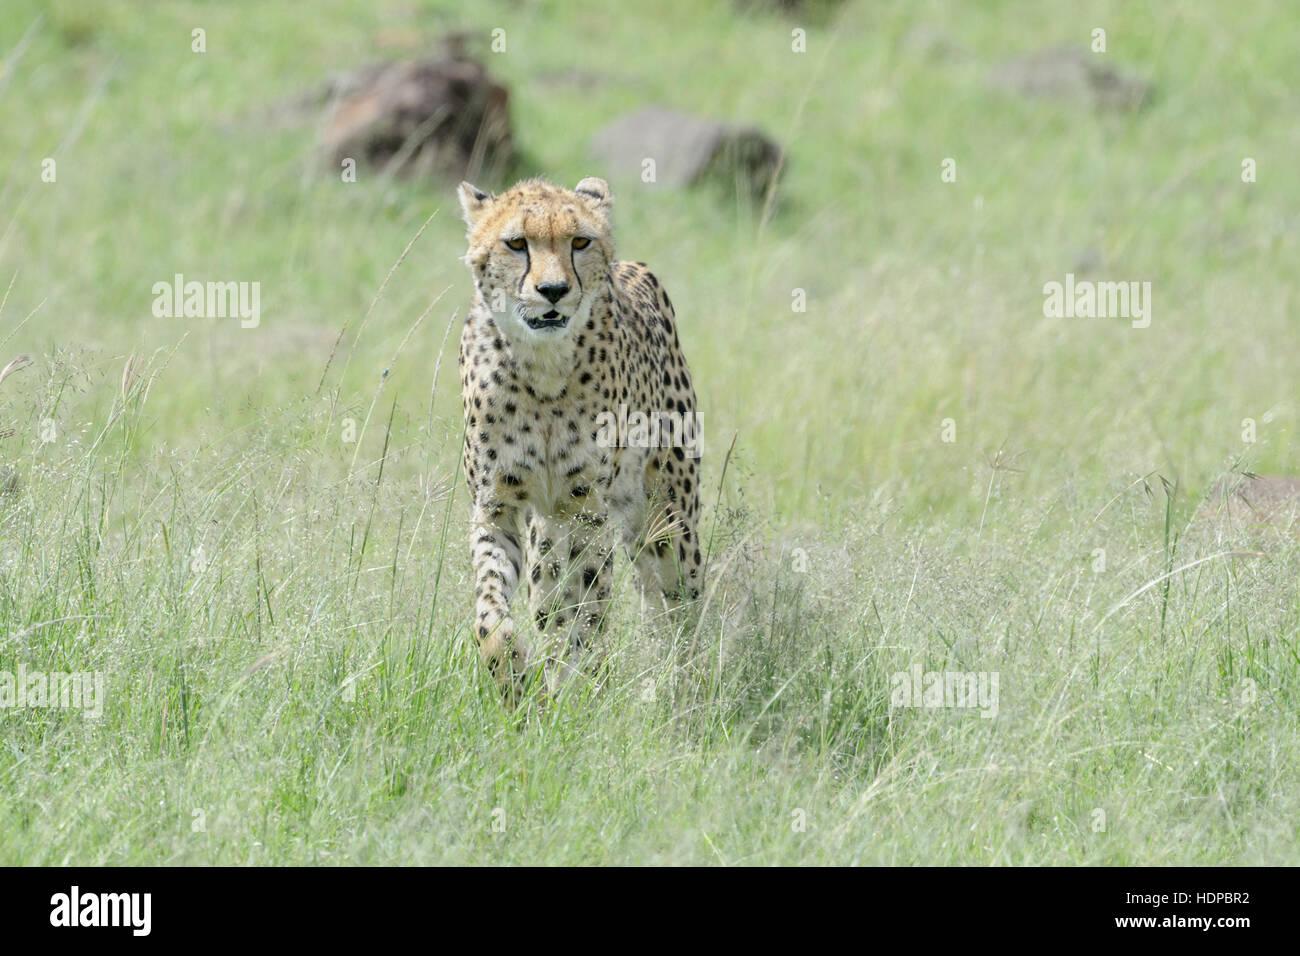 Ghepardo (Acinonix jubatus) camminando sulla savana, il Masai Mara riserva nazionale, Kenya Immagini Stock